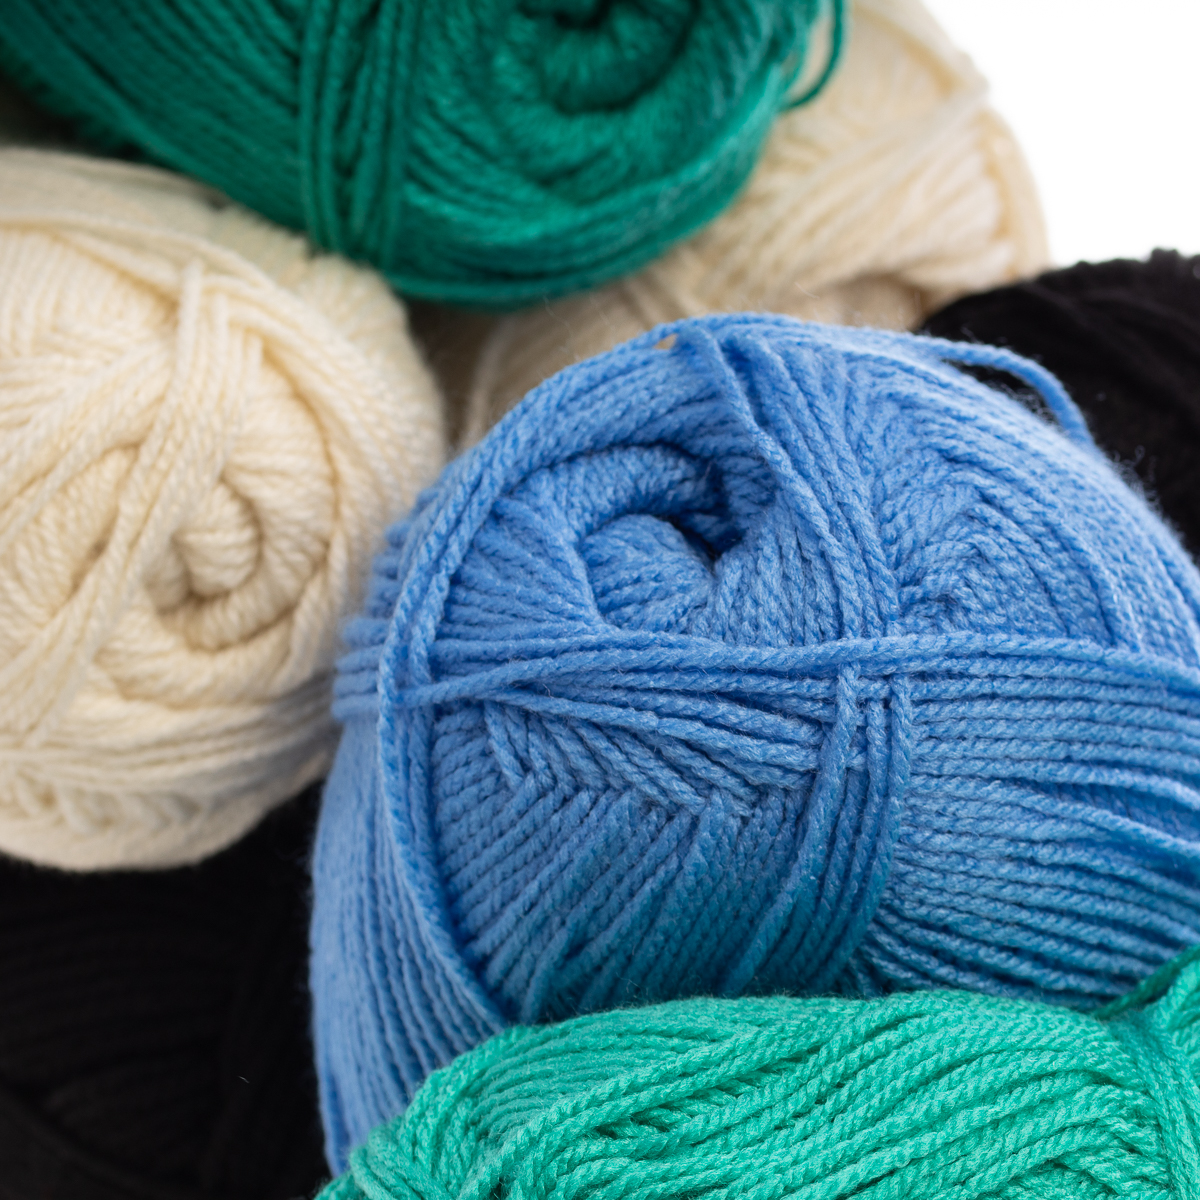 4-Dream-Weaver-Solid-S-Twist-100-Acrylic-Yarn-Skeins-Light-3-Knit-Crochet-Soft thumbnail 17